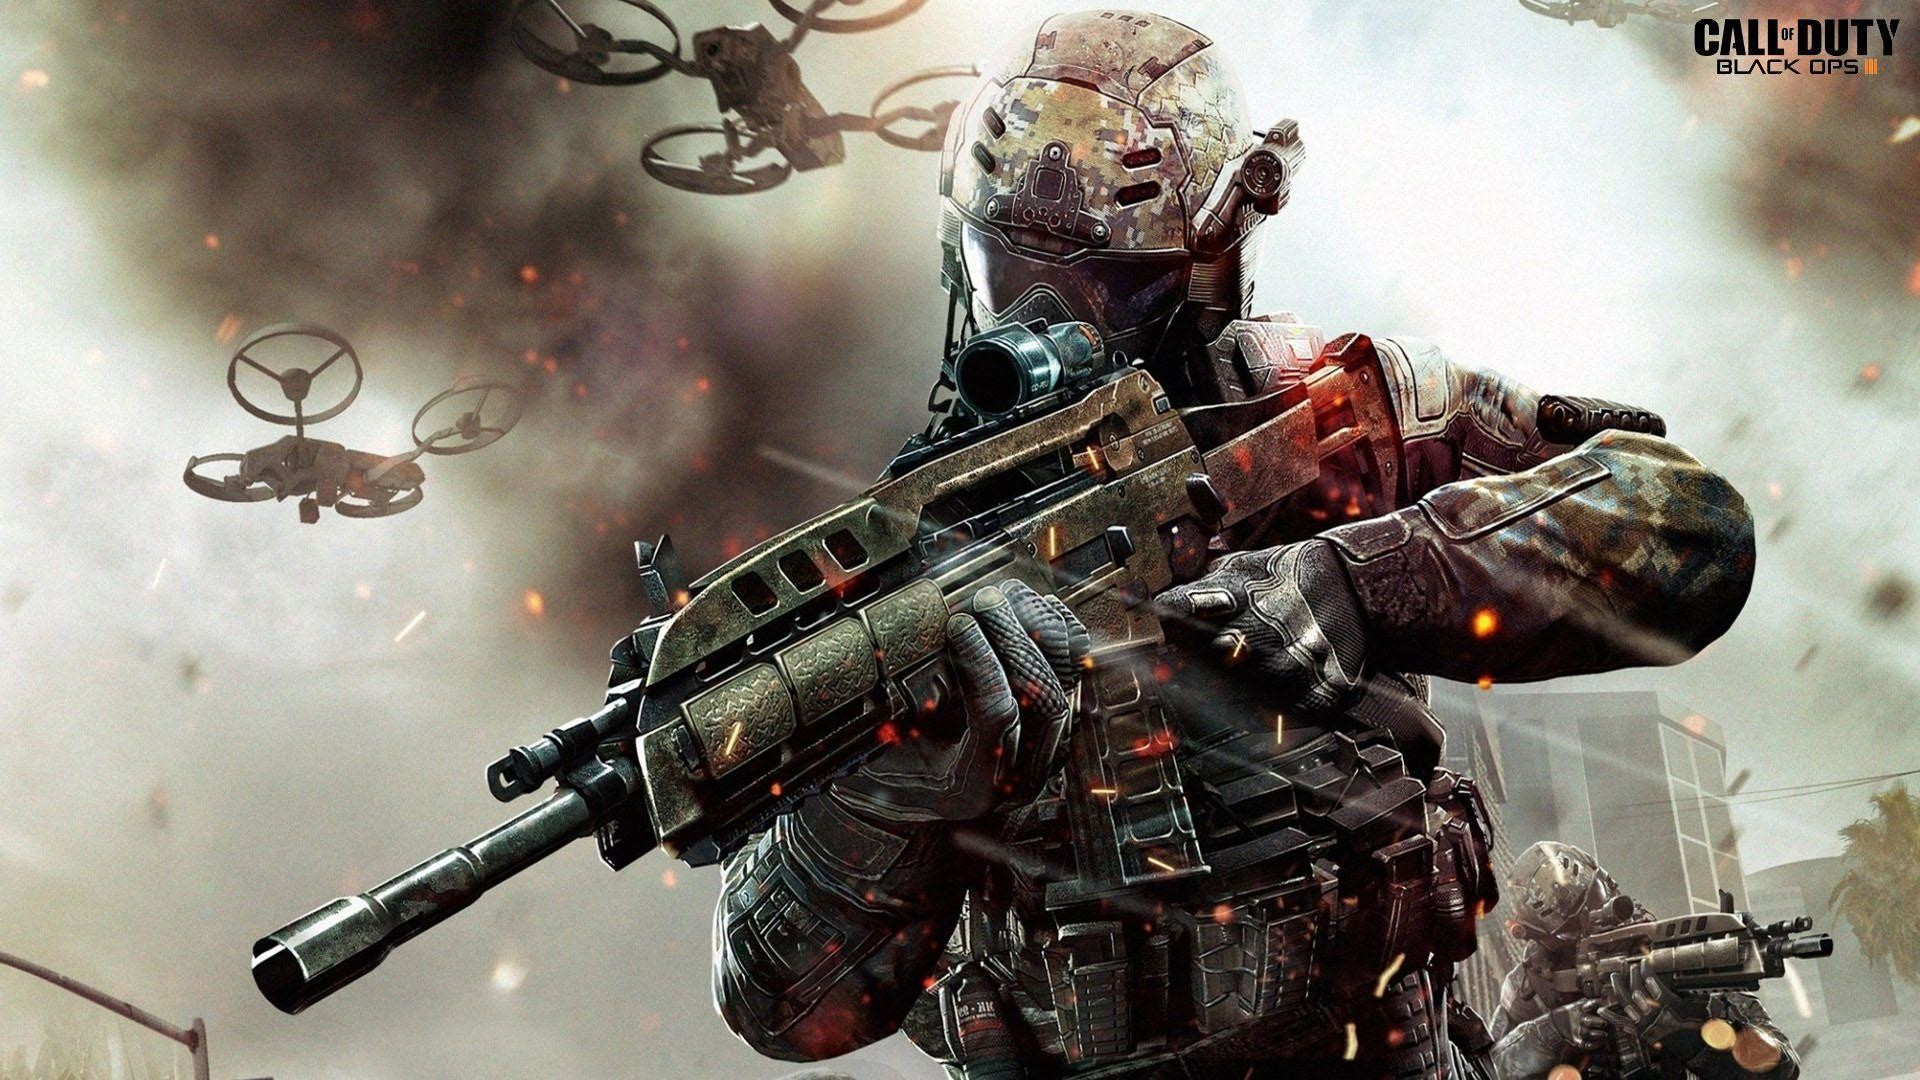 Download Call Of Duty Black Ops 3 Reaper Wallpaper Hd